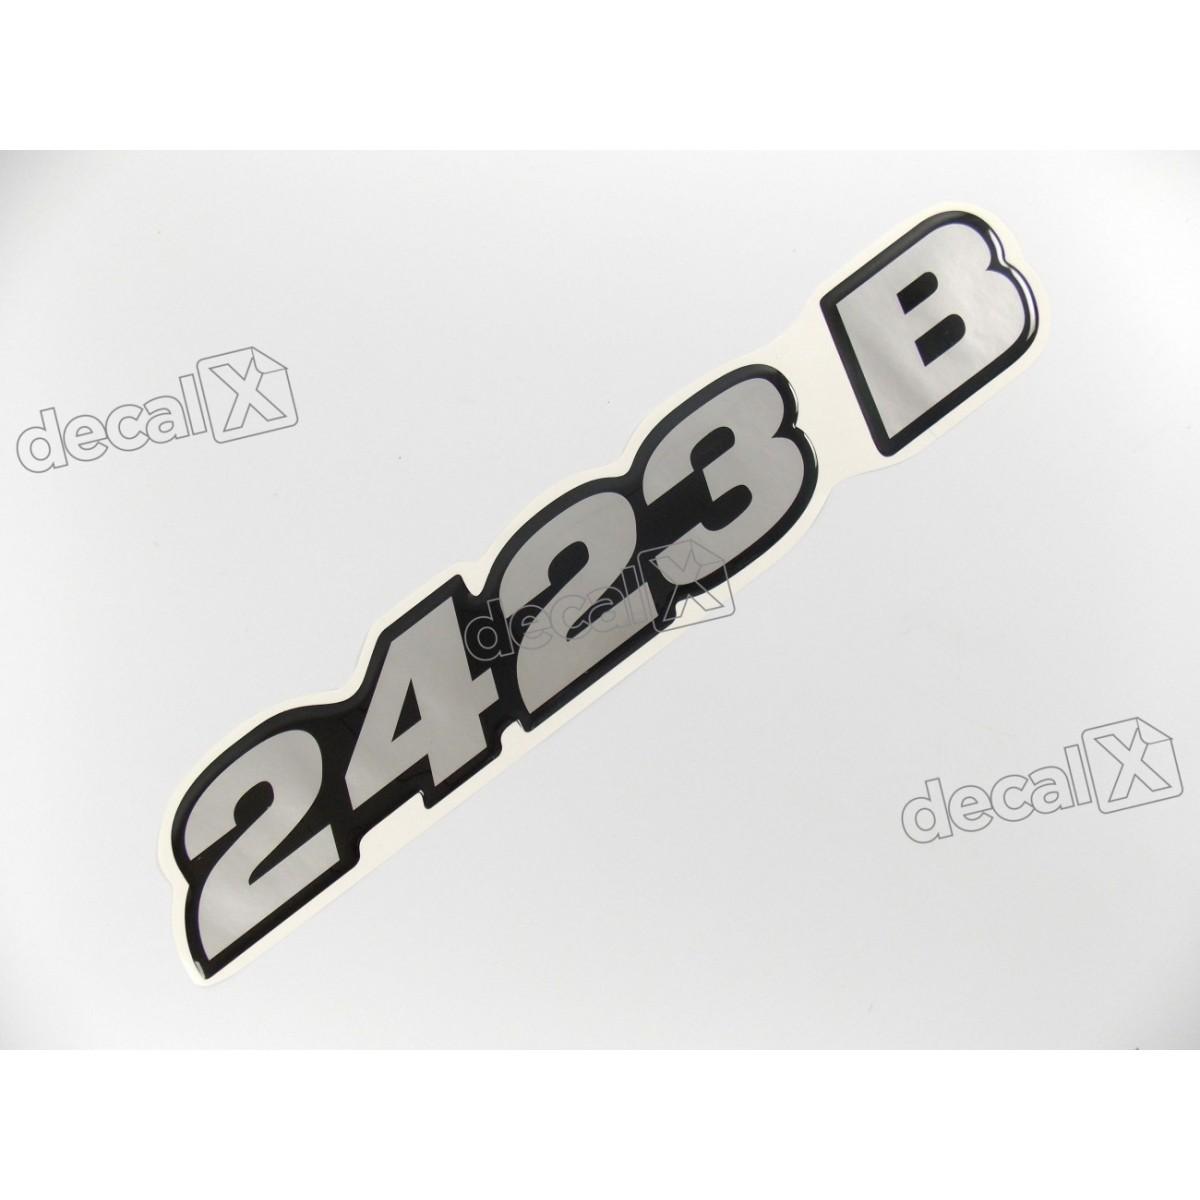 Adesivo Emblema Resinado Mercedes 2423 B Cm85 Decalx